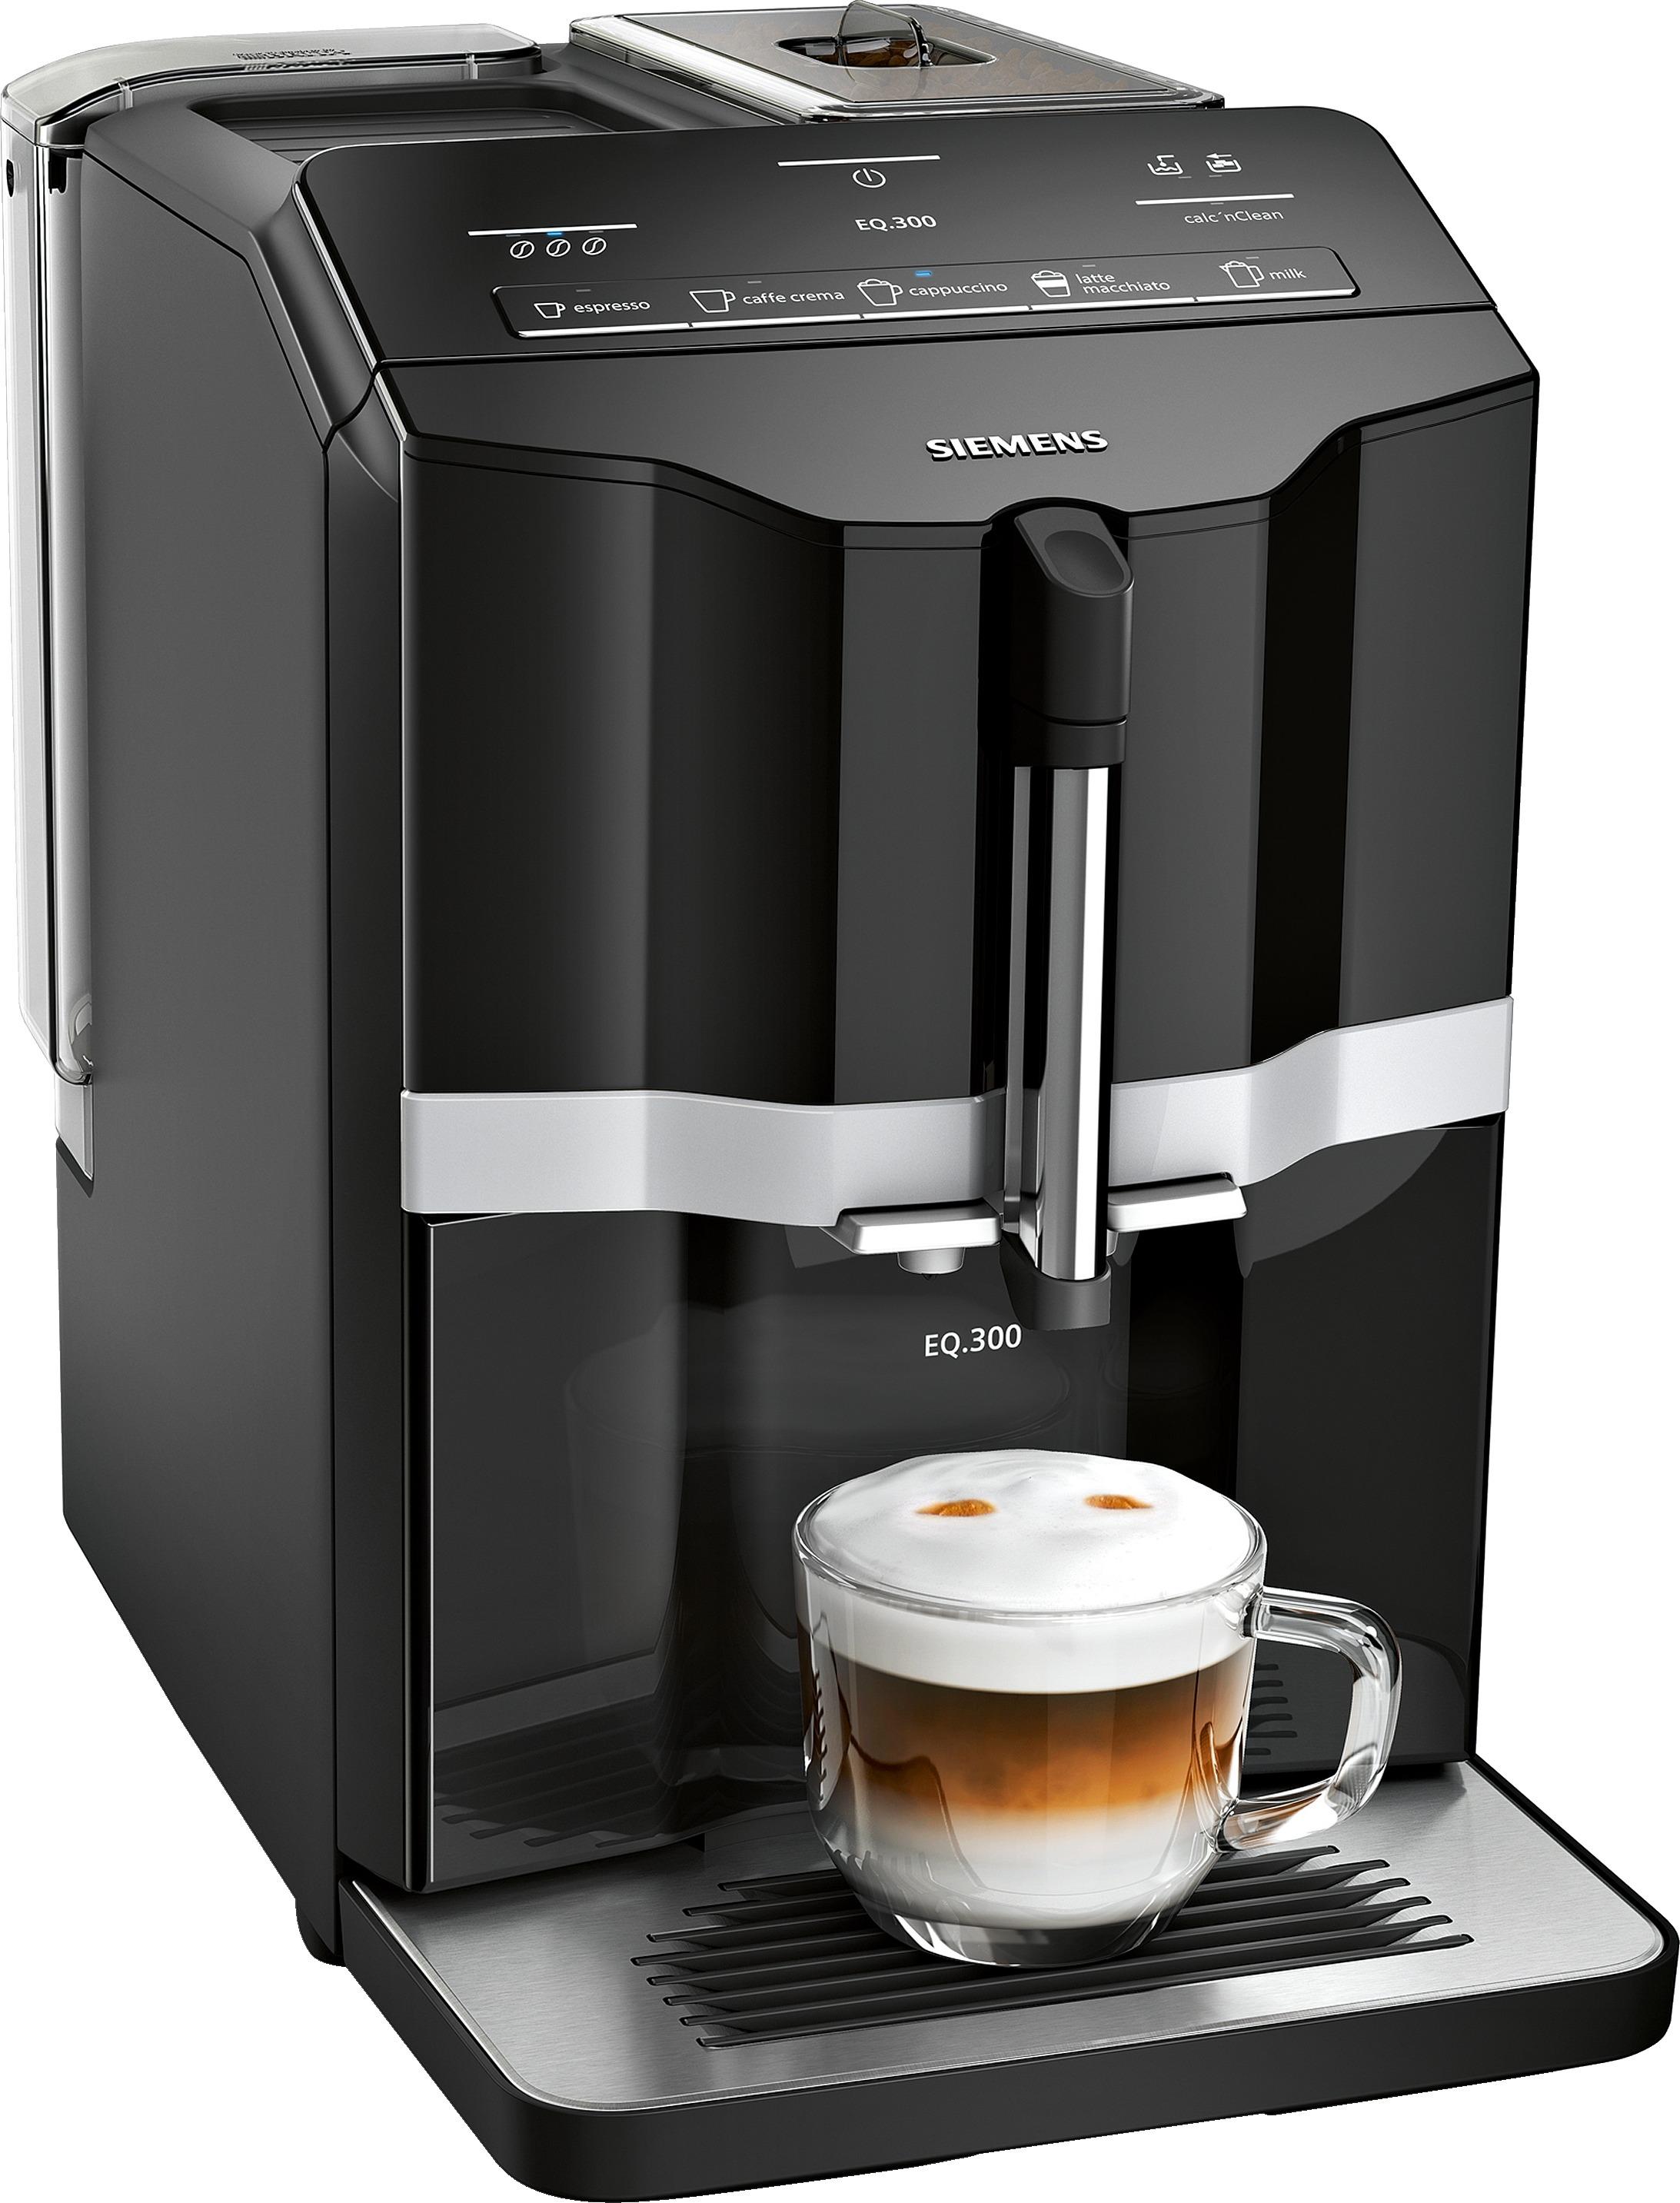 Siemens TI351209RW volautomaat